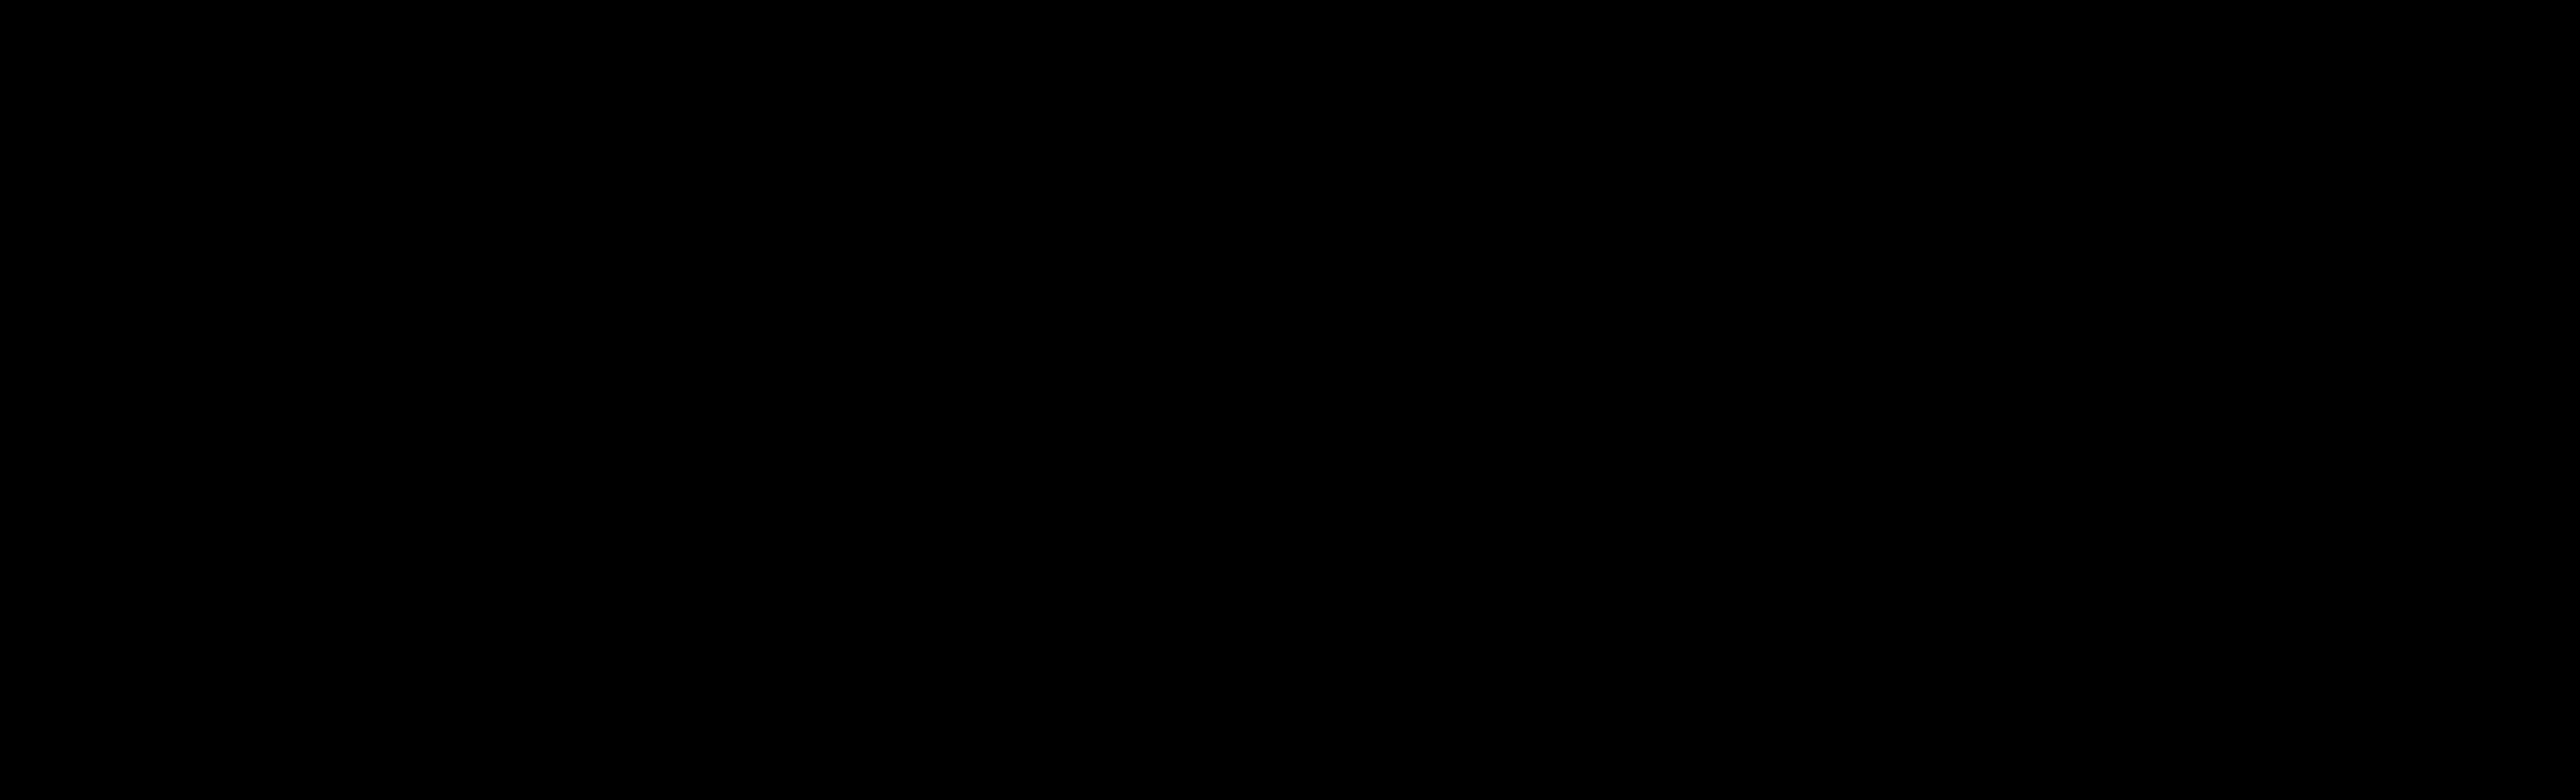 logo-black-flat